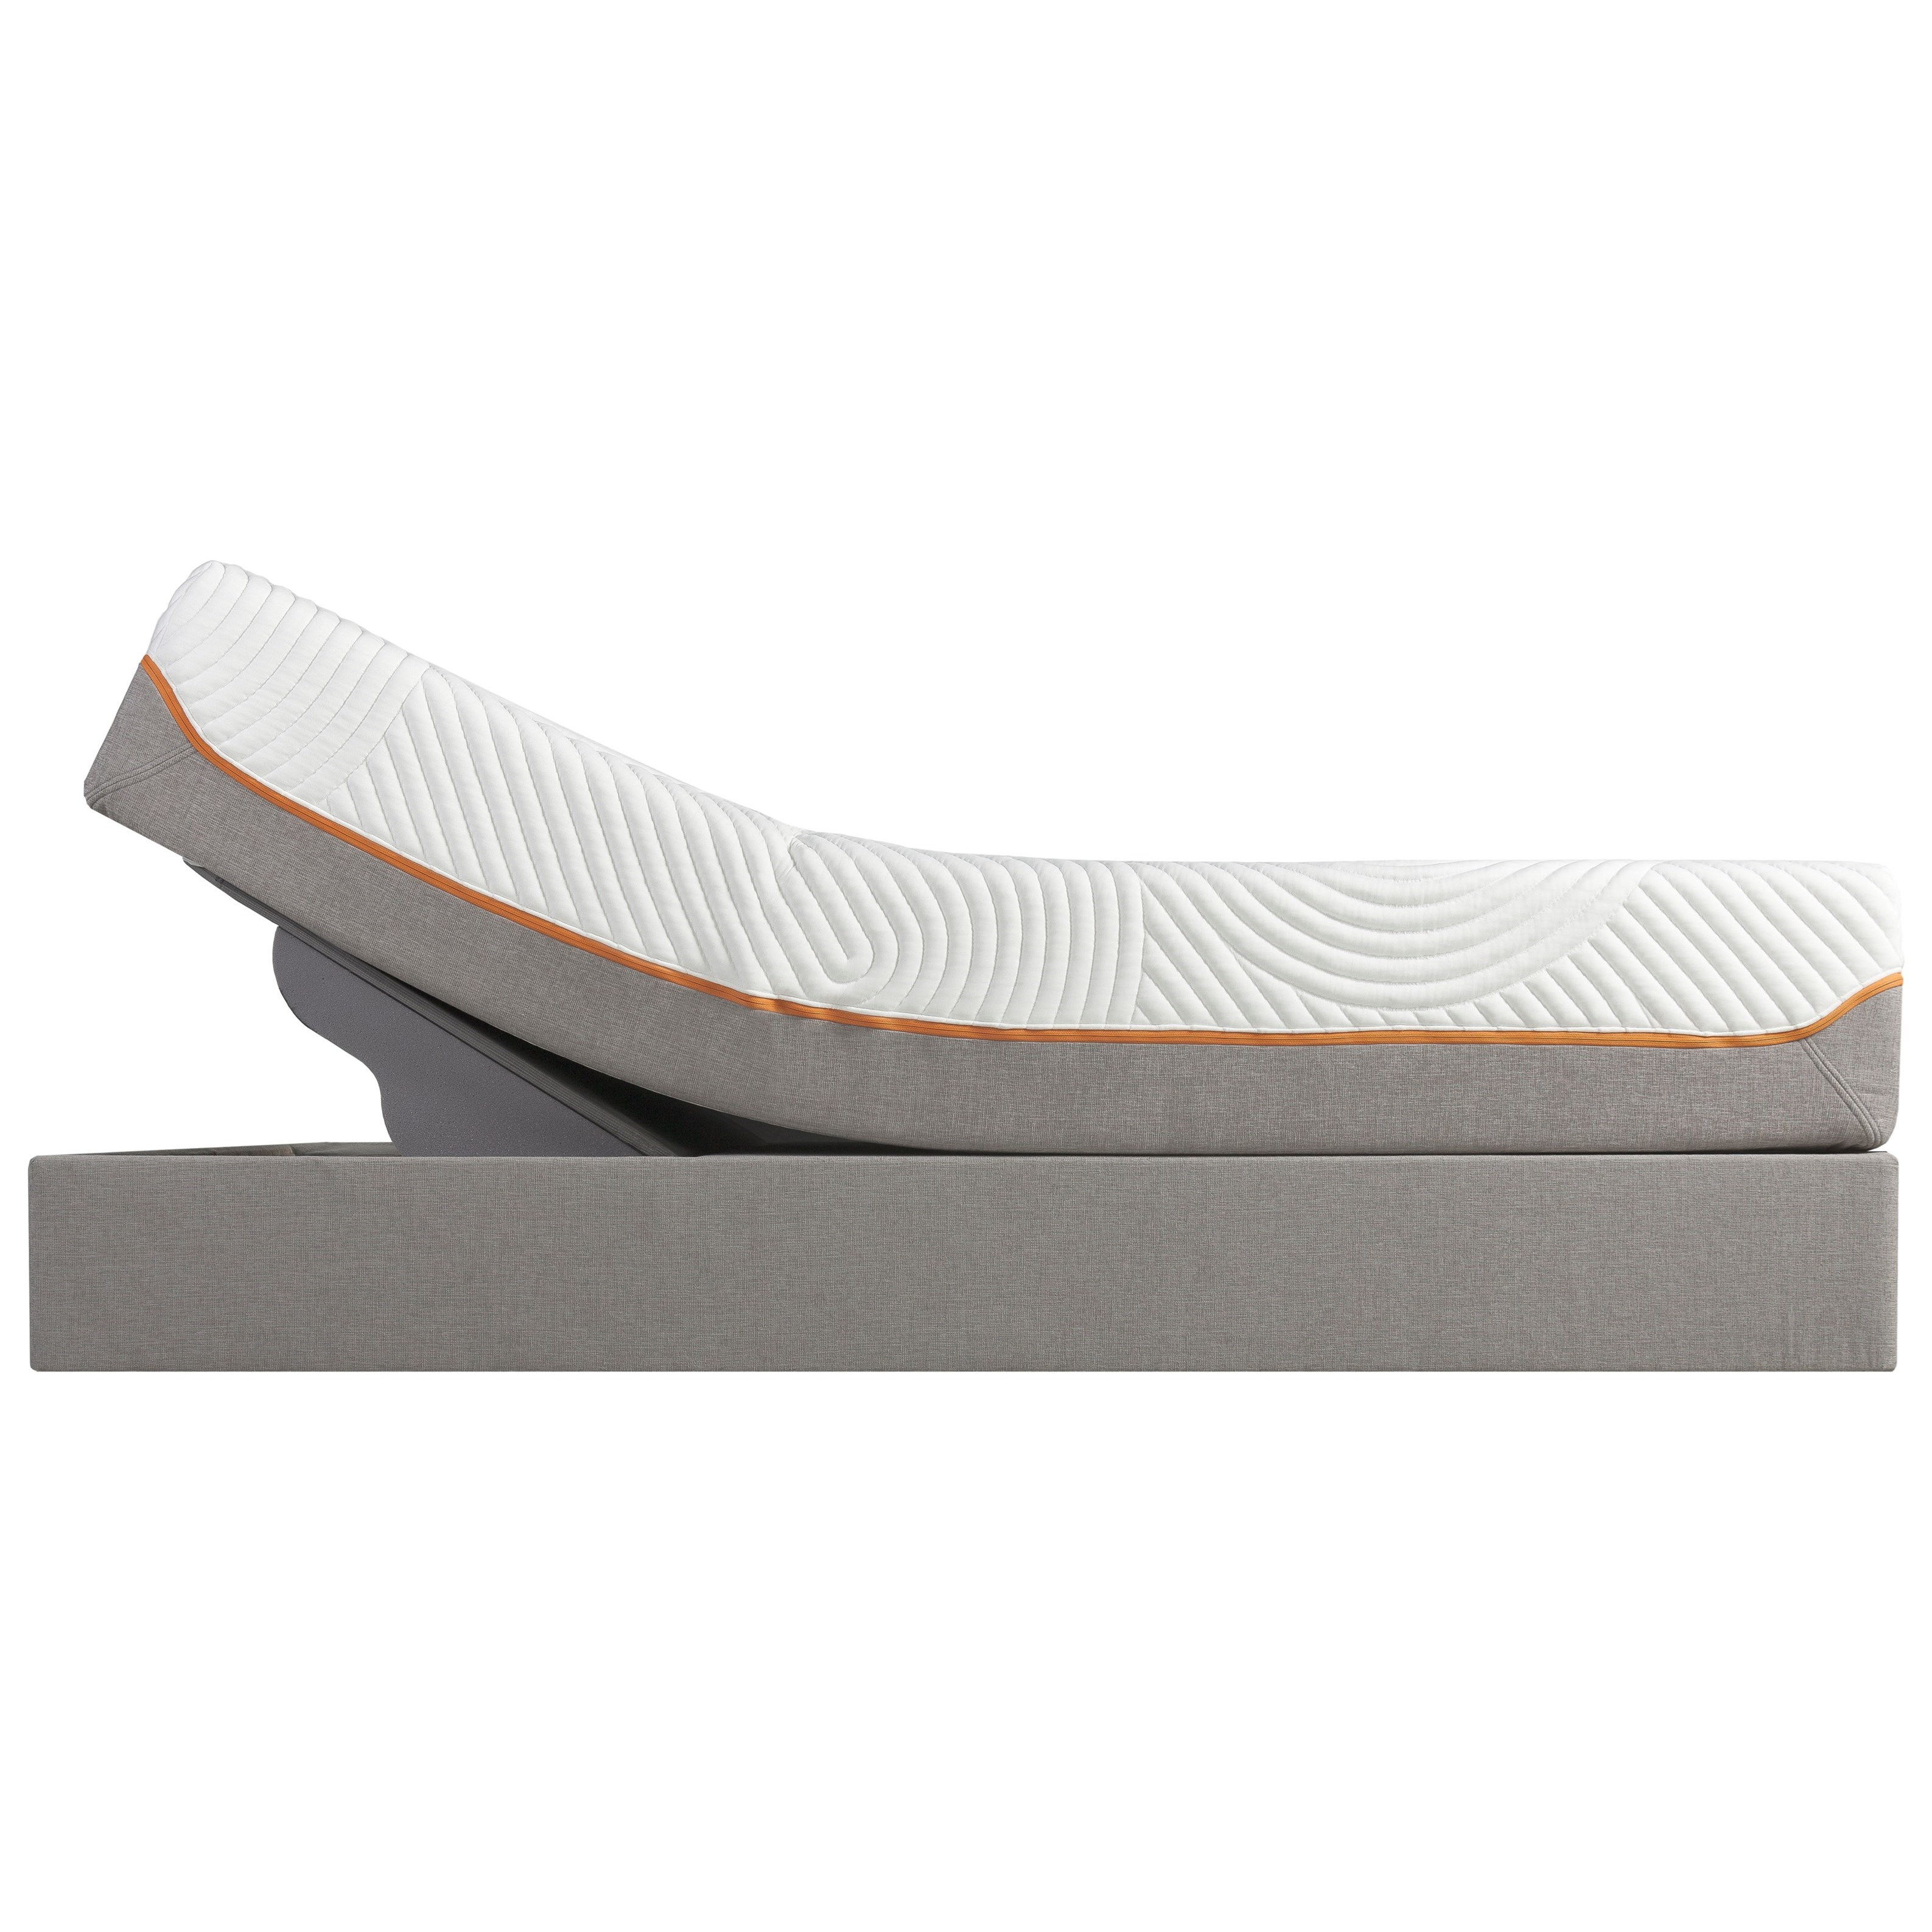 Tempur-Pedic® TEMPUR-Contour Elite Twin XL Medium-Firm Mattress Set - Item Number: 10257120+25287120